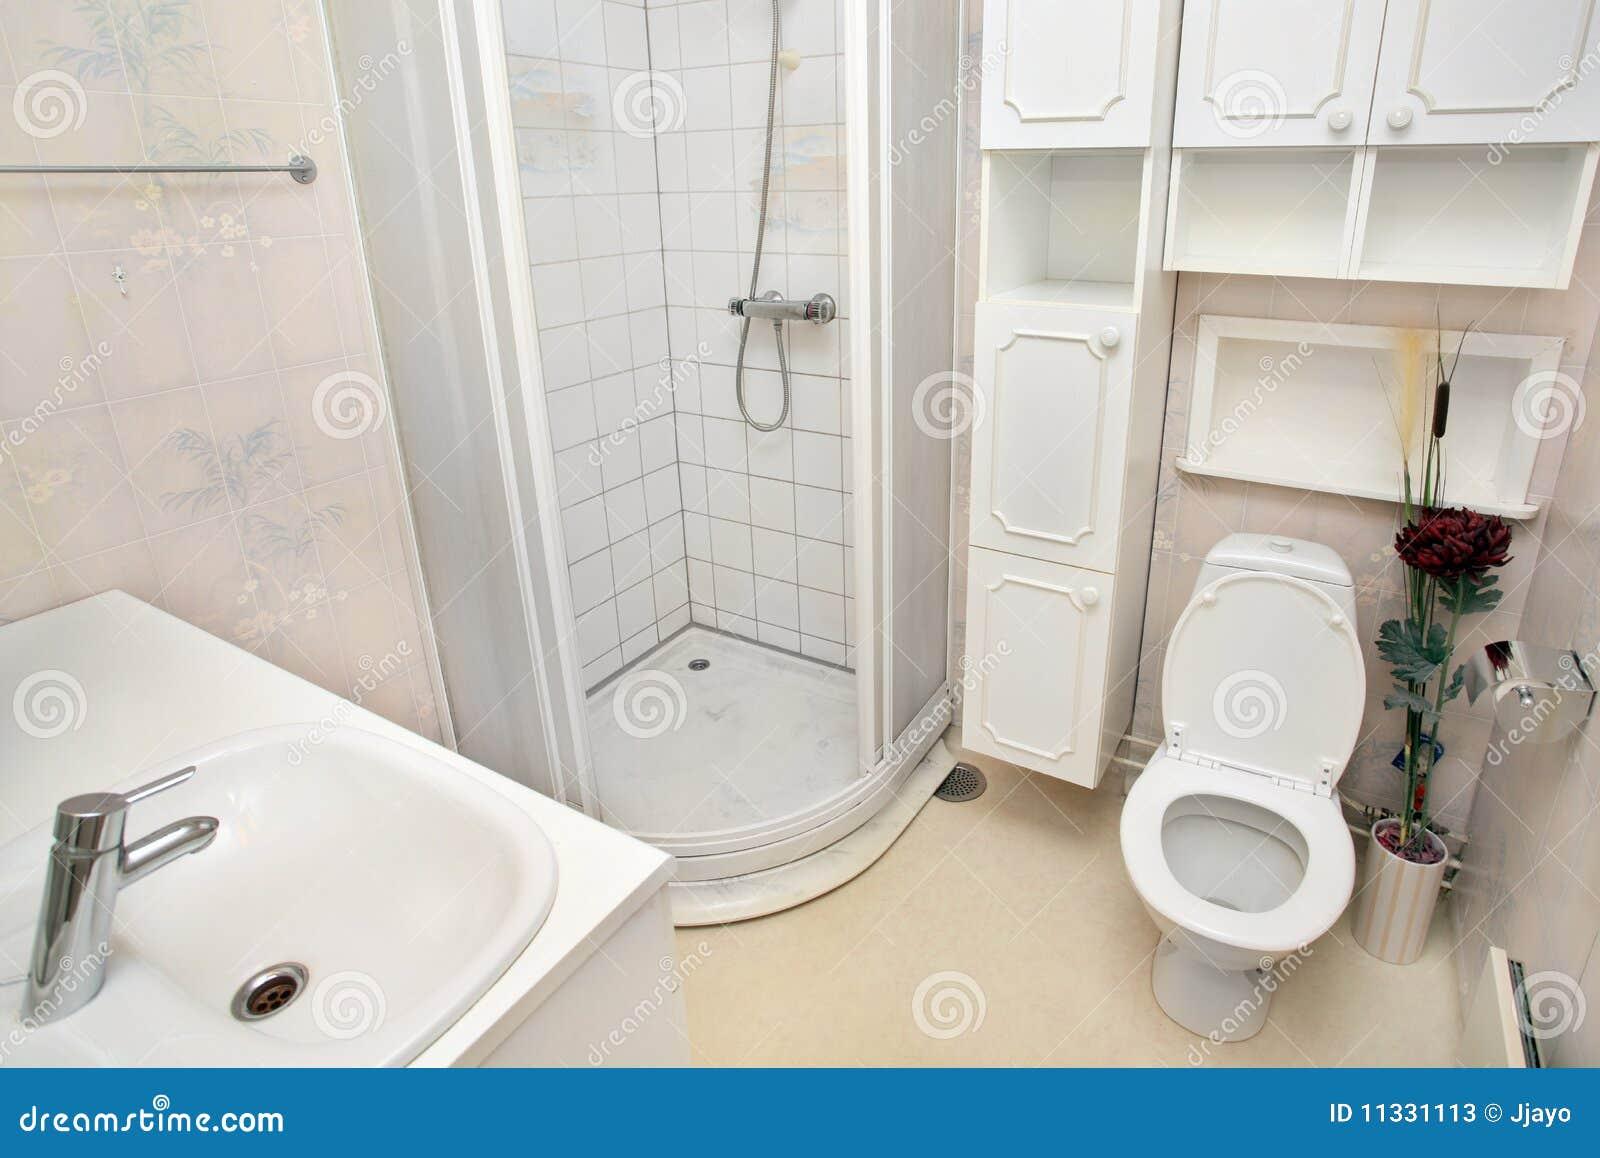 Interior of small white bathroom stock photos image for Small bathroom interior